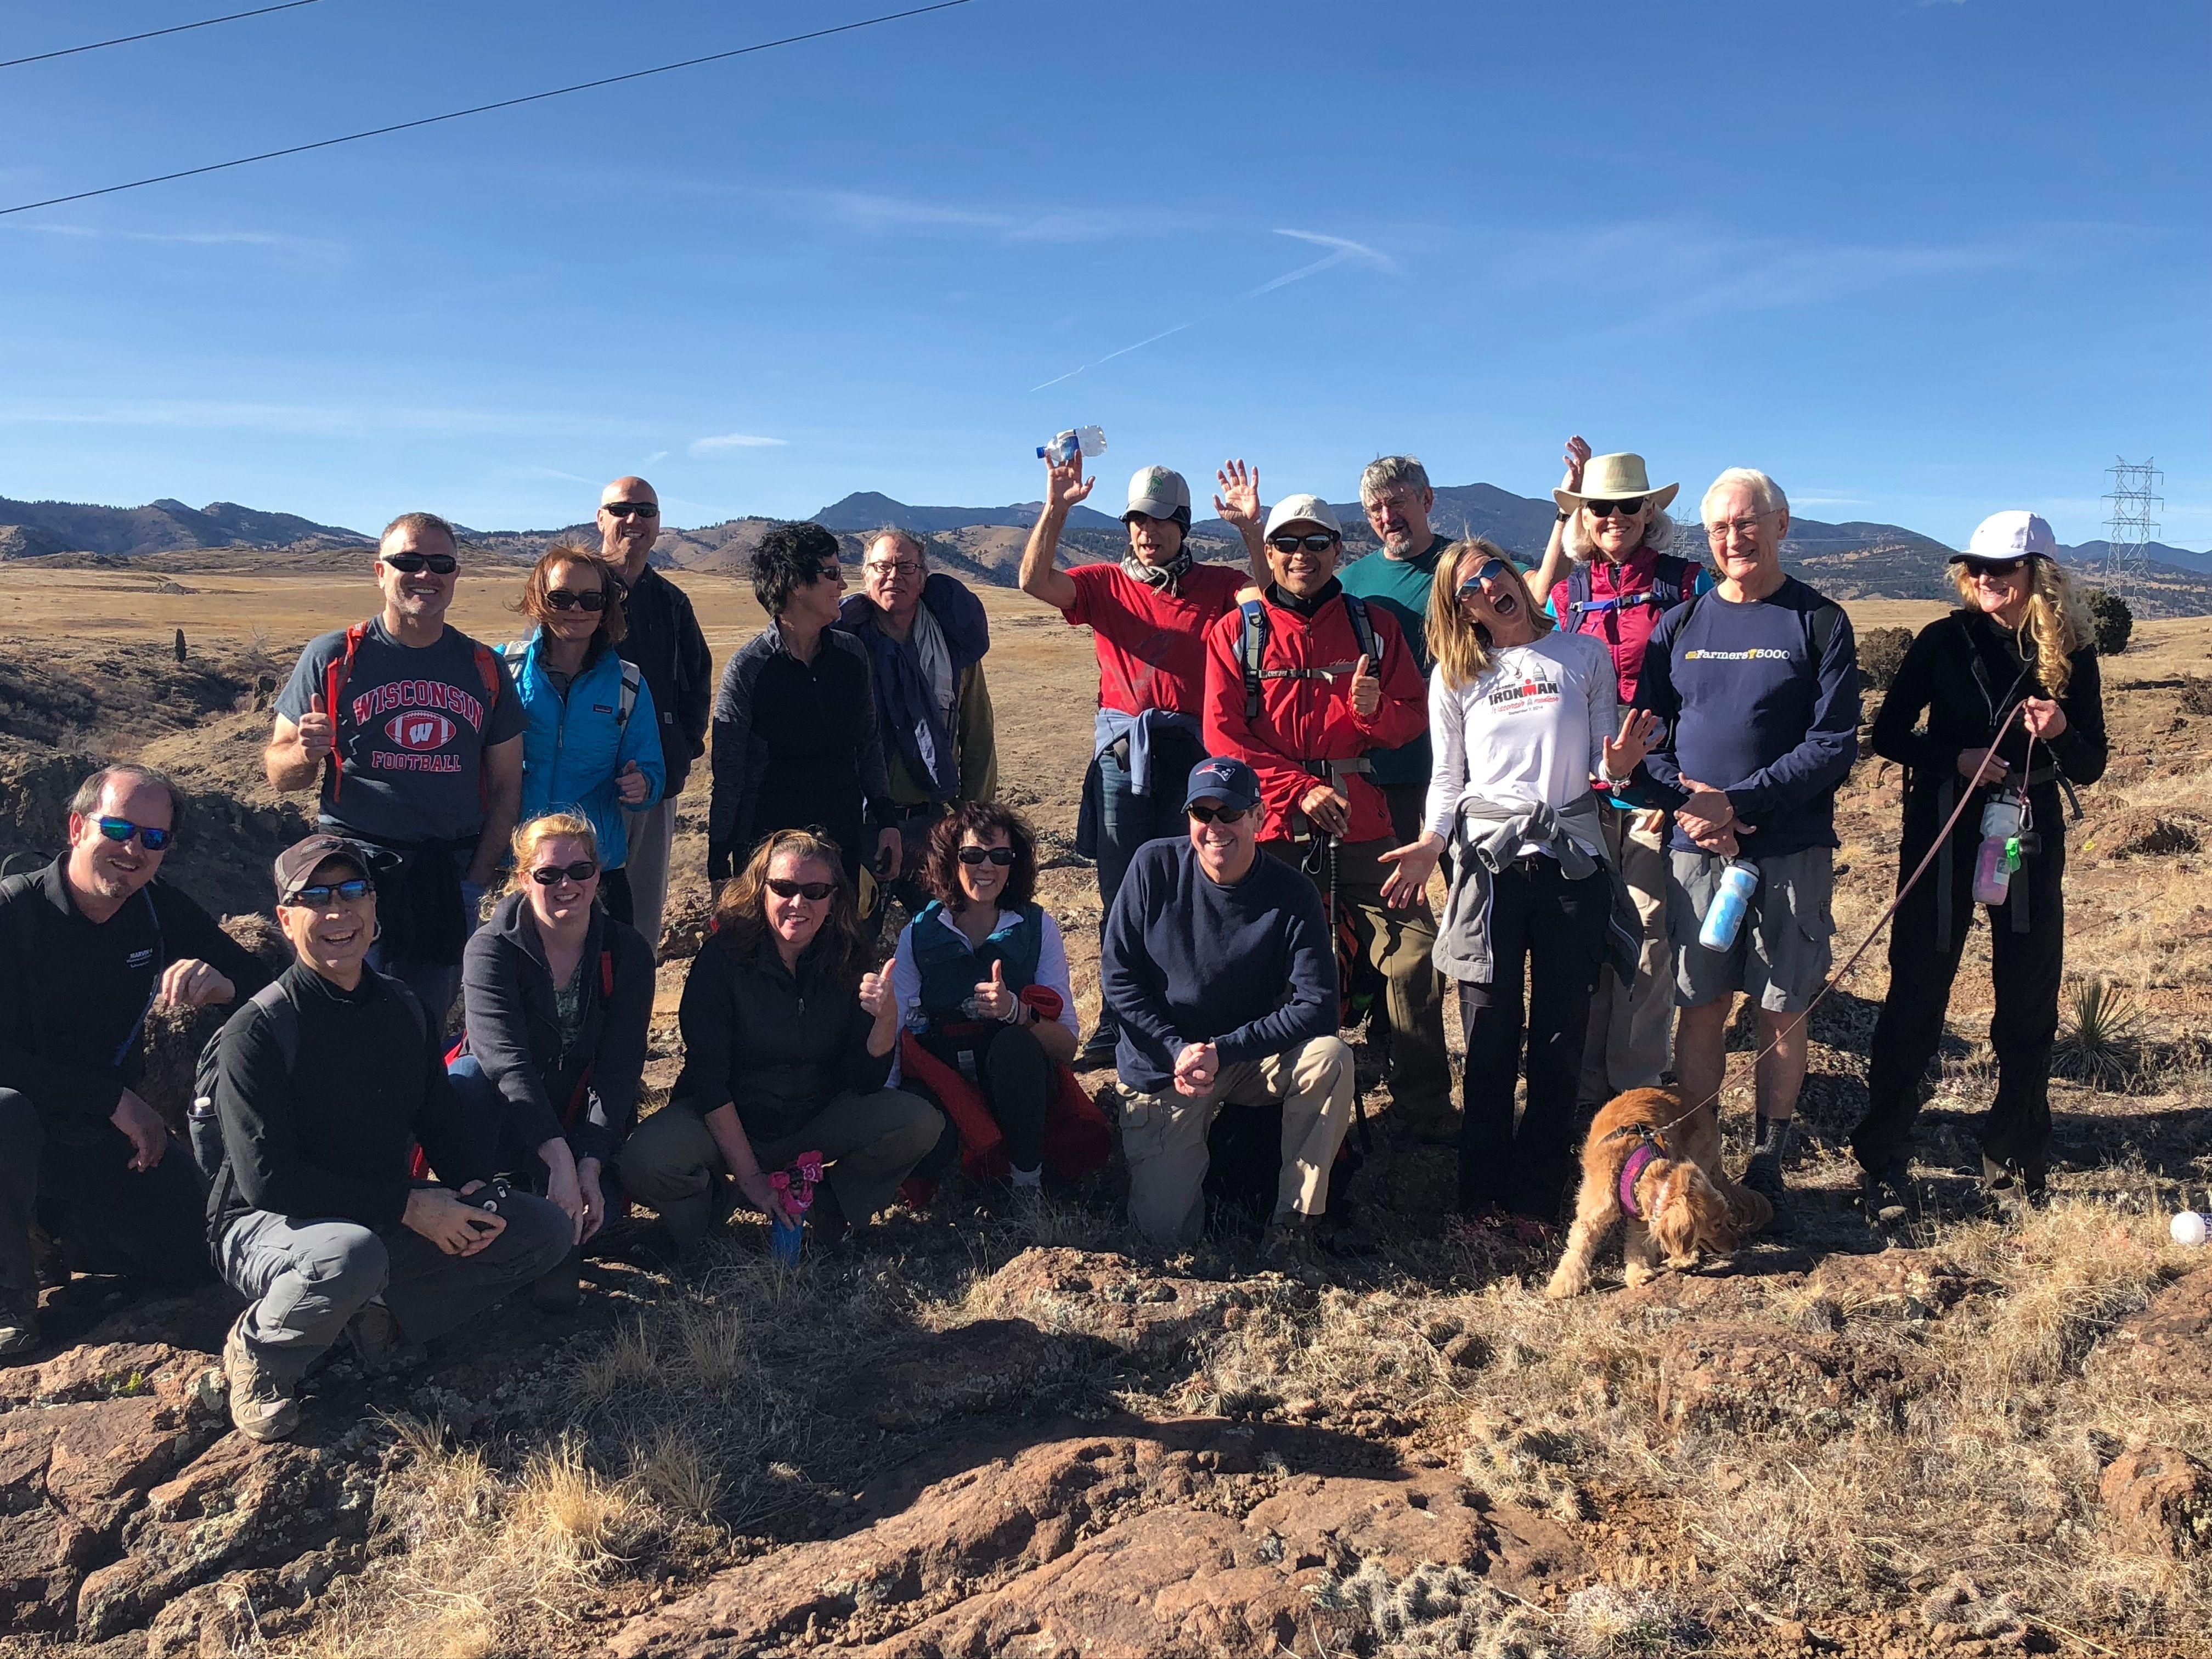 Denver West Activities (DWA)